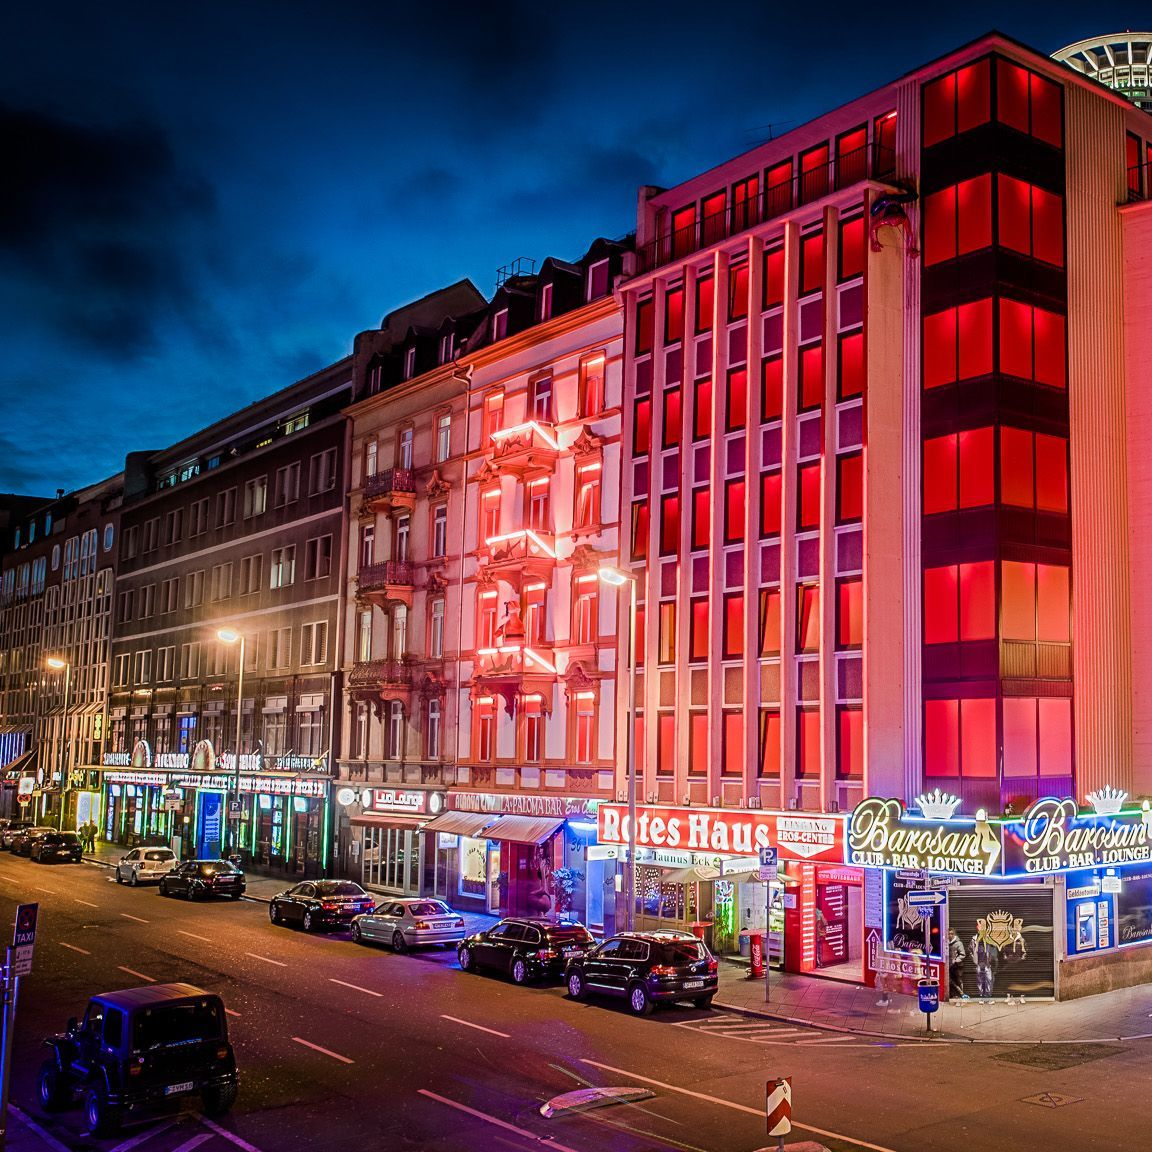 33 Top Images Rotes Haus Frankfurt / Dom Romer Areal Bau